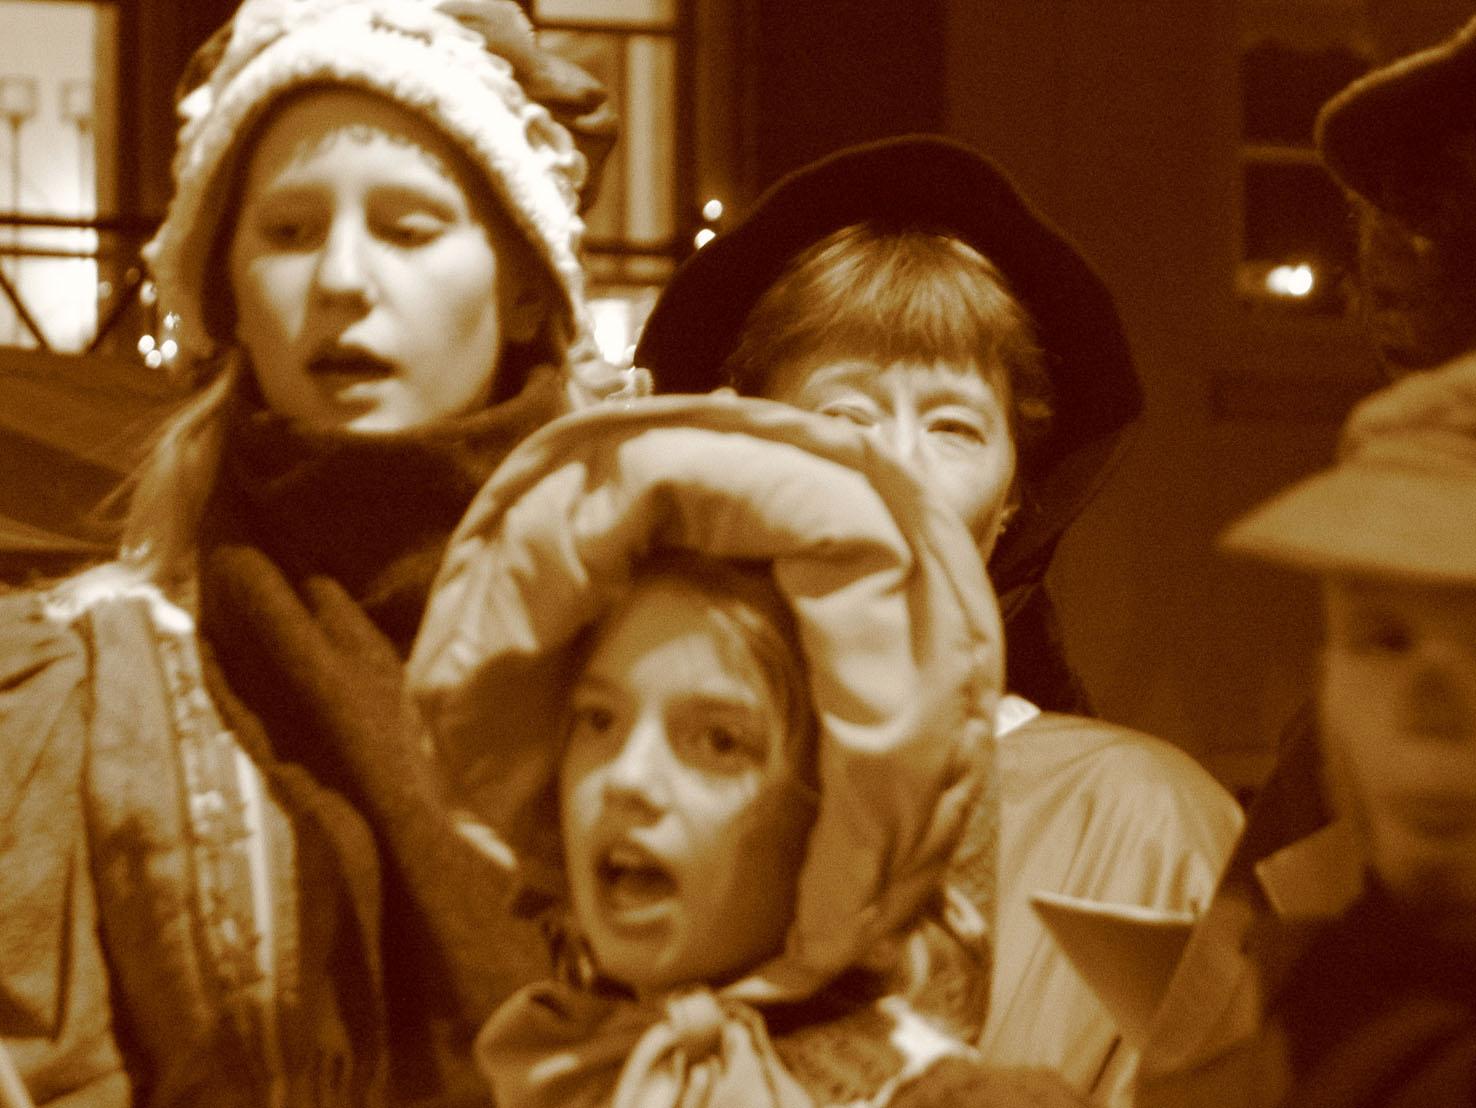 170 - Kerstmarkt Helmond 2003.jpg